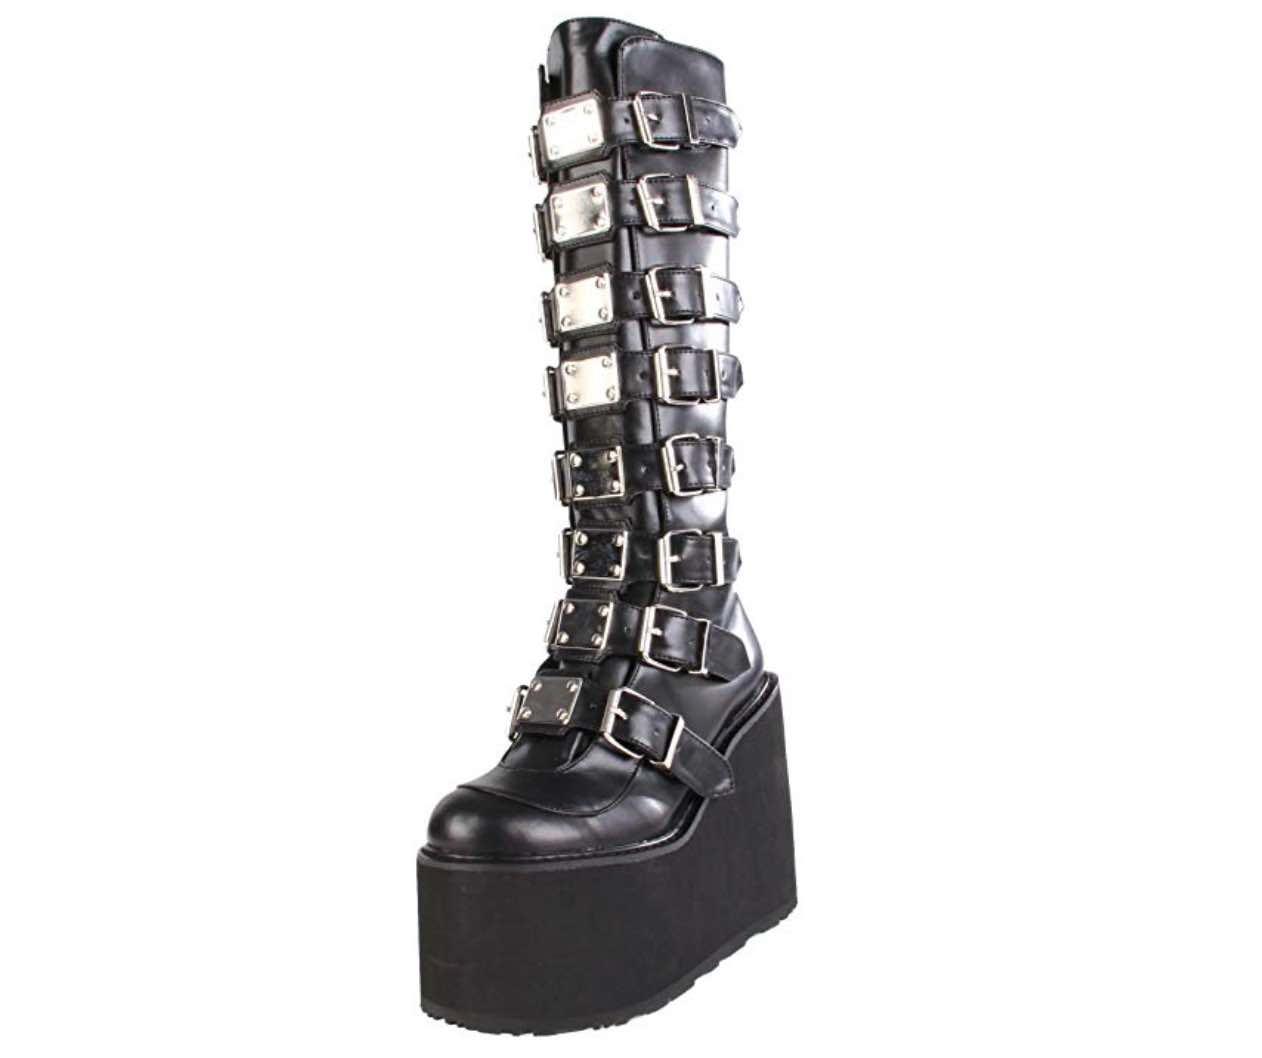 Pleaser Women's Swing-815 Knee-High Boot - Festival Boots